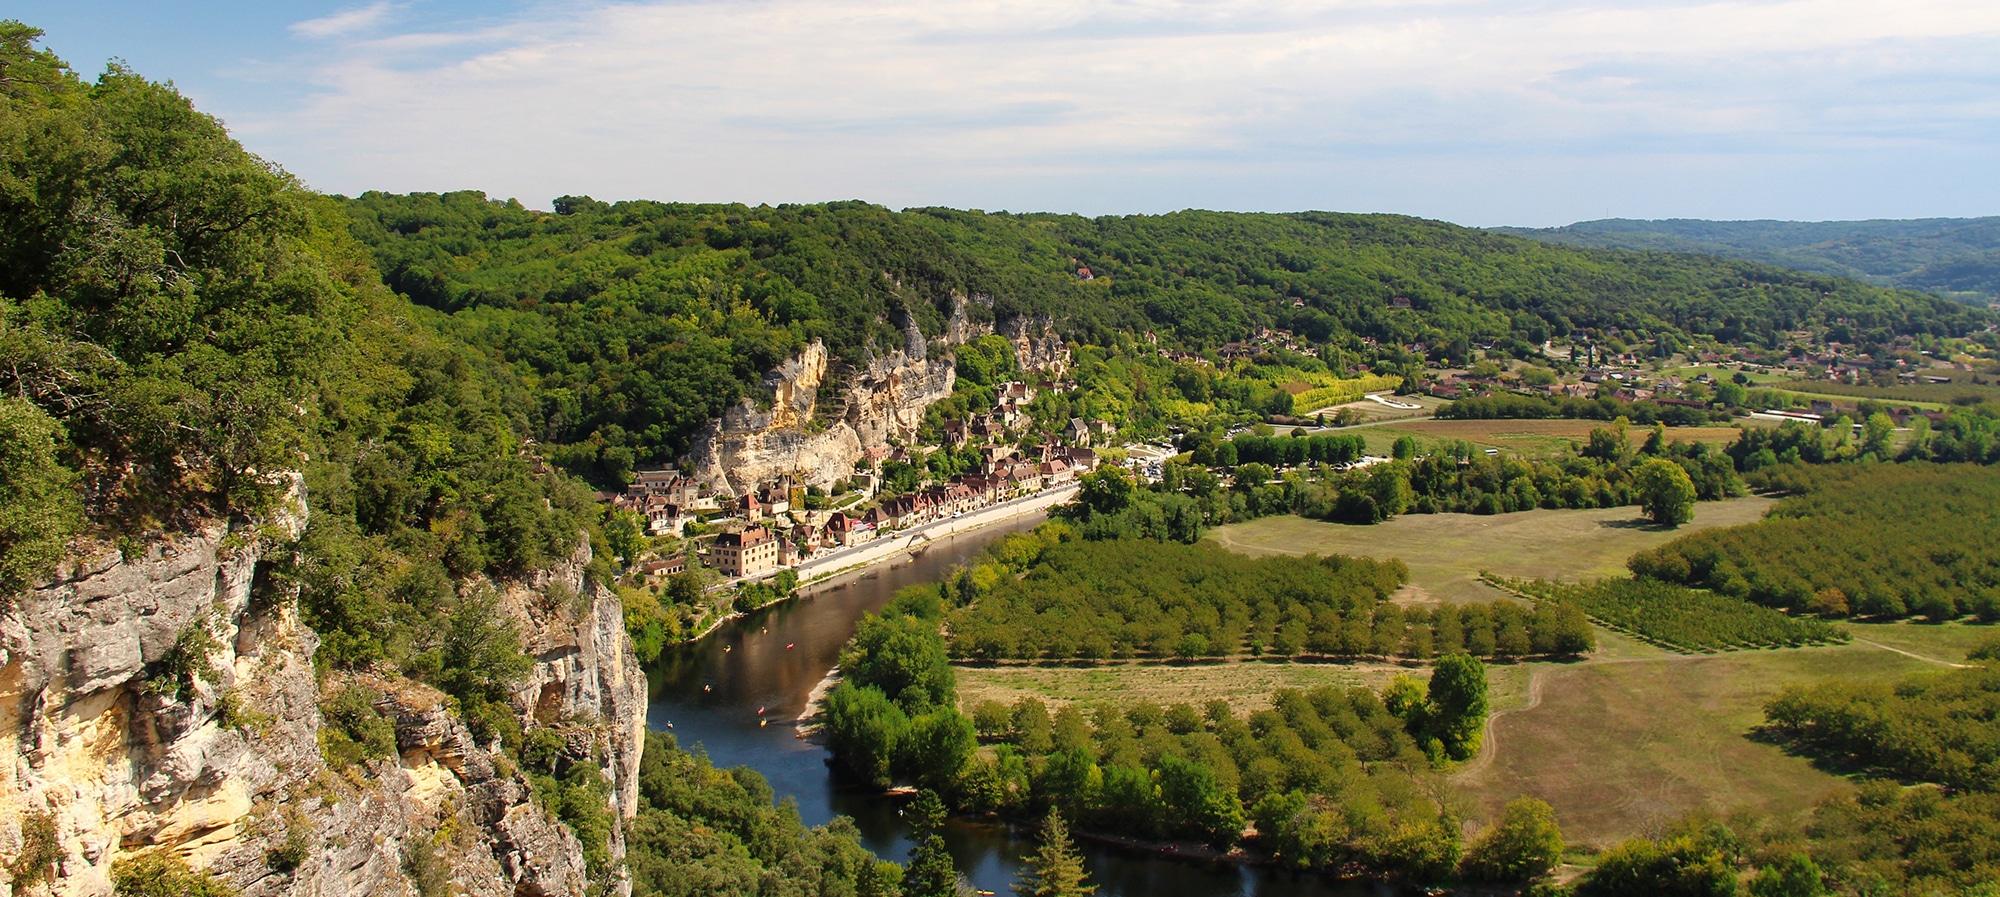 Camping La Dordogne Verte : Dordogne Background